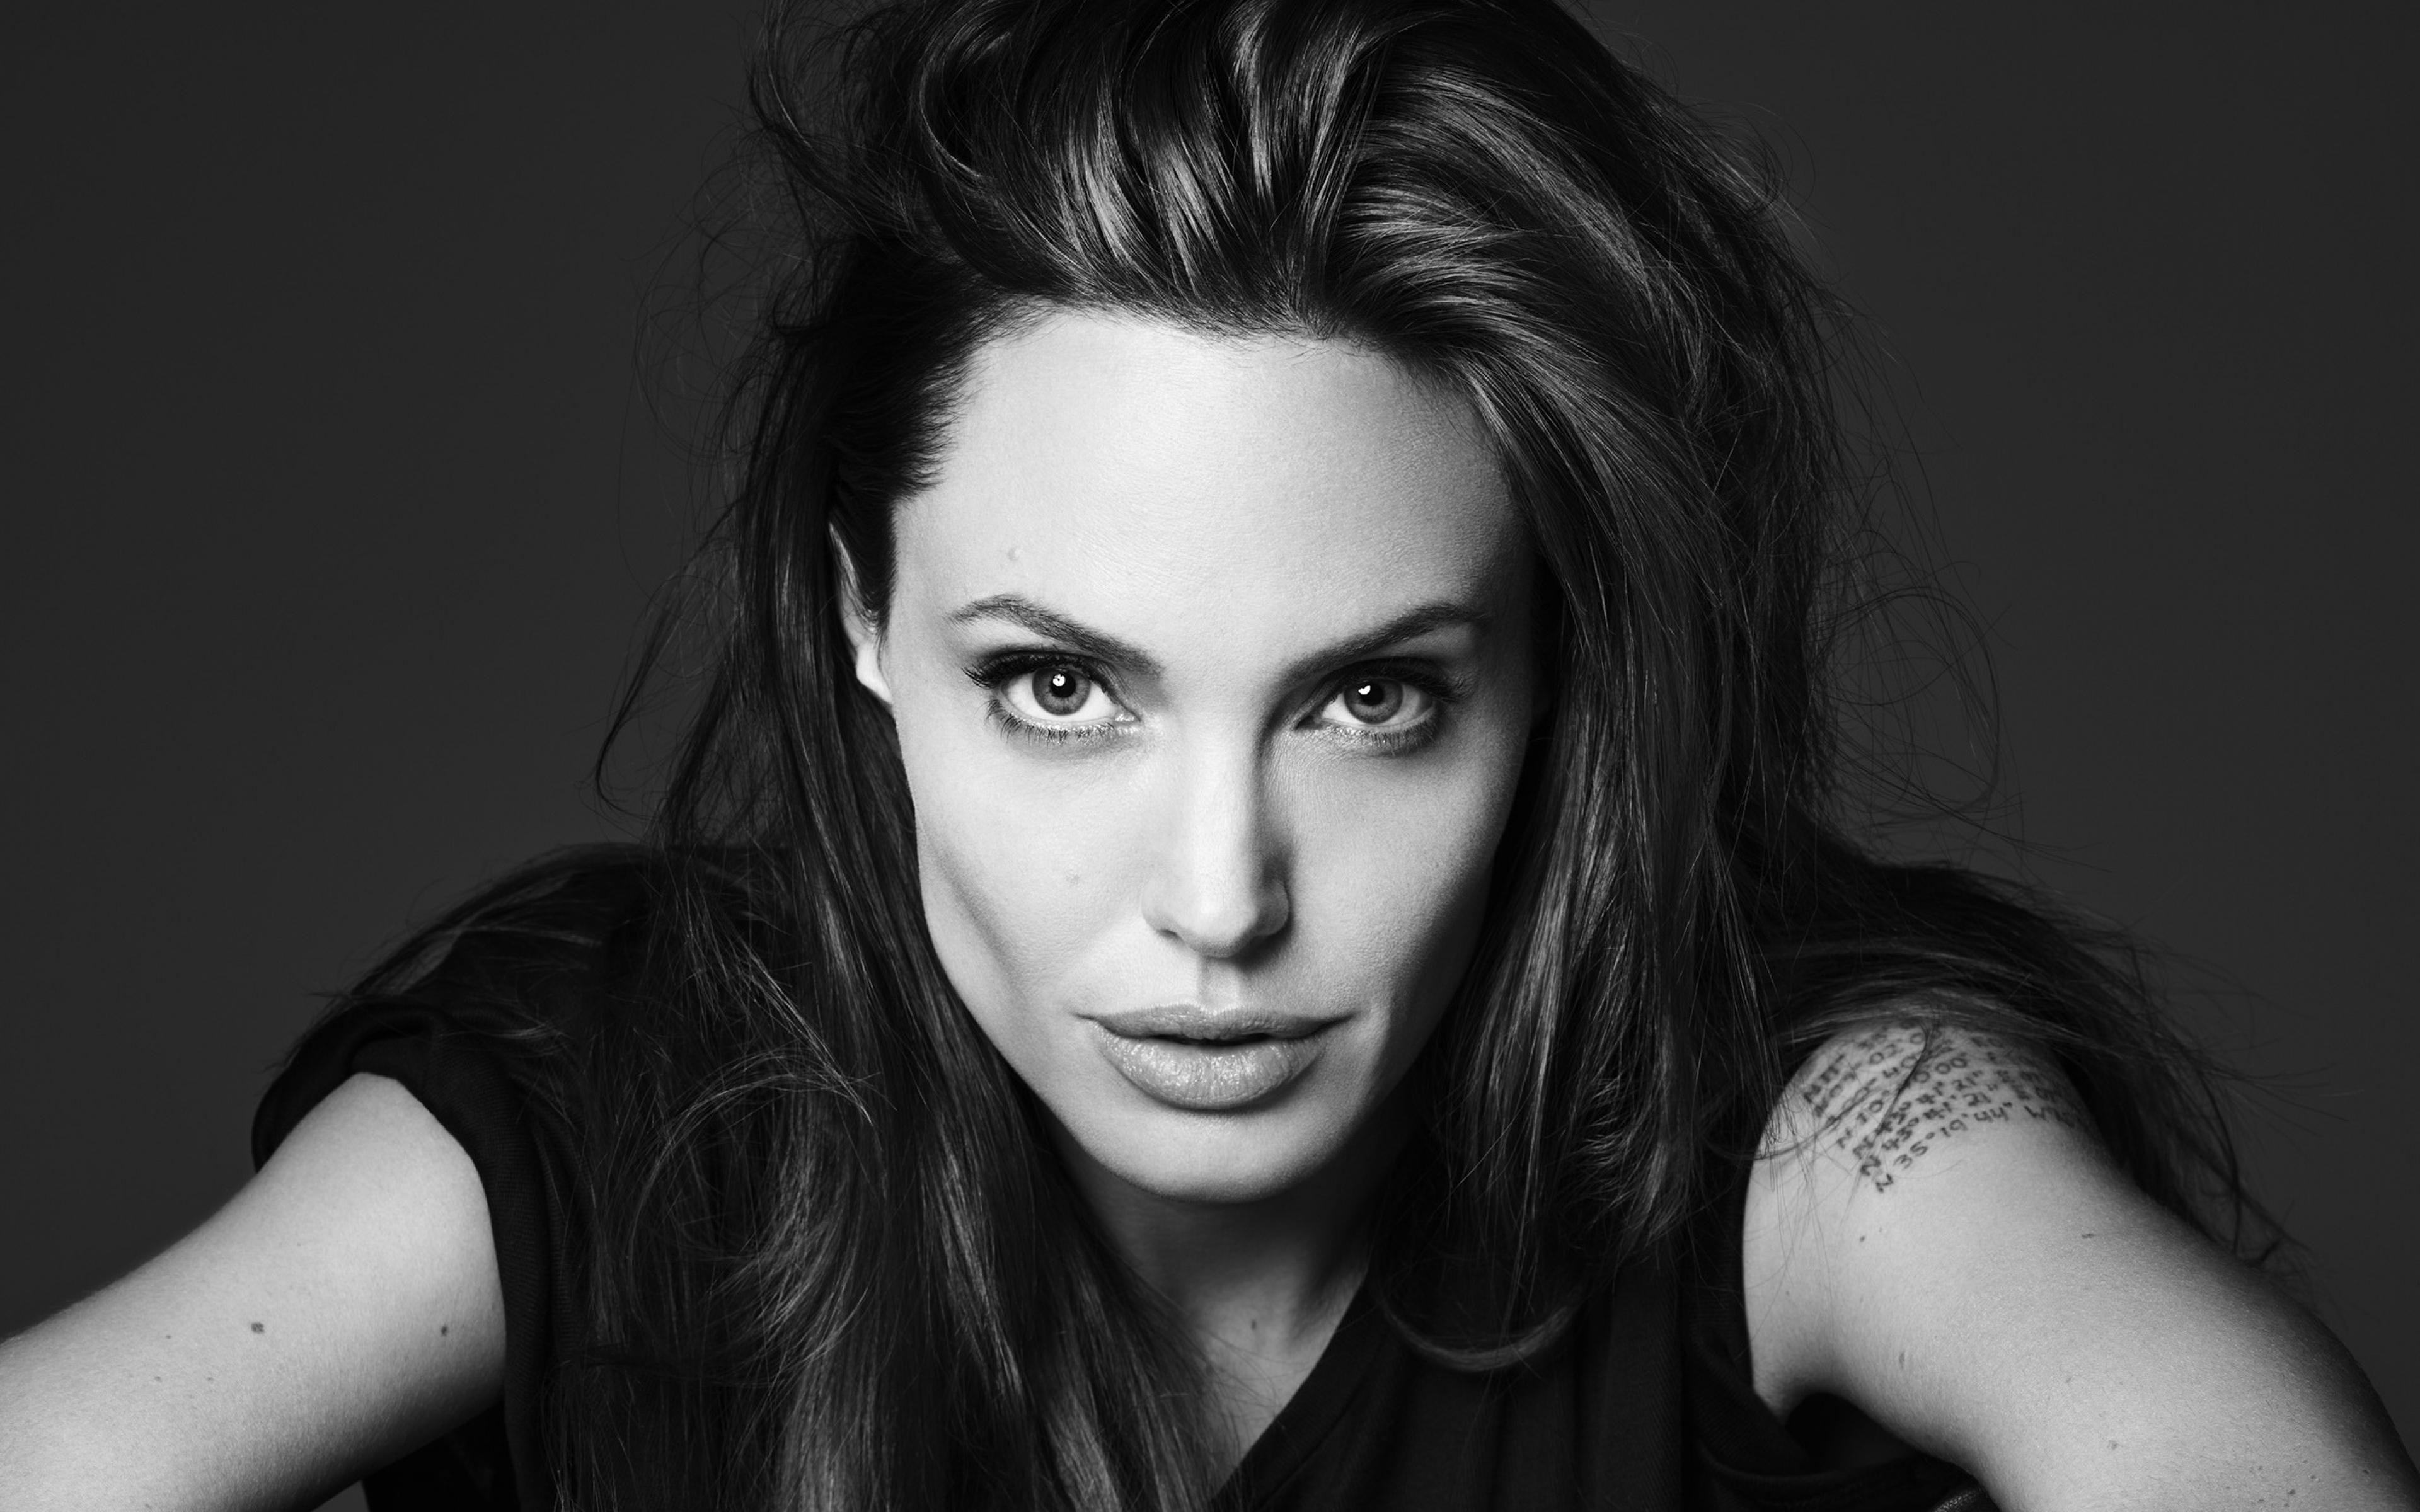 Angelina Jolie Hd Wallpapers: Angelina Jolie, HD Celebrities, 4k Wallpapers, Images